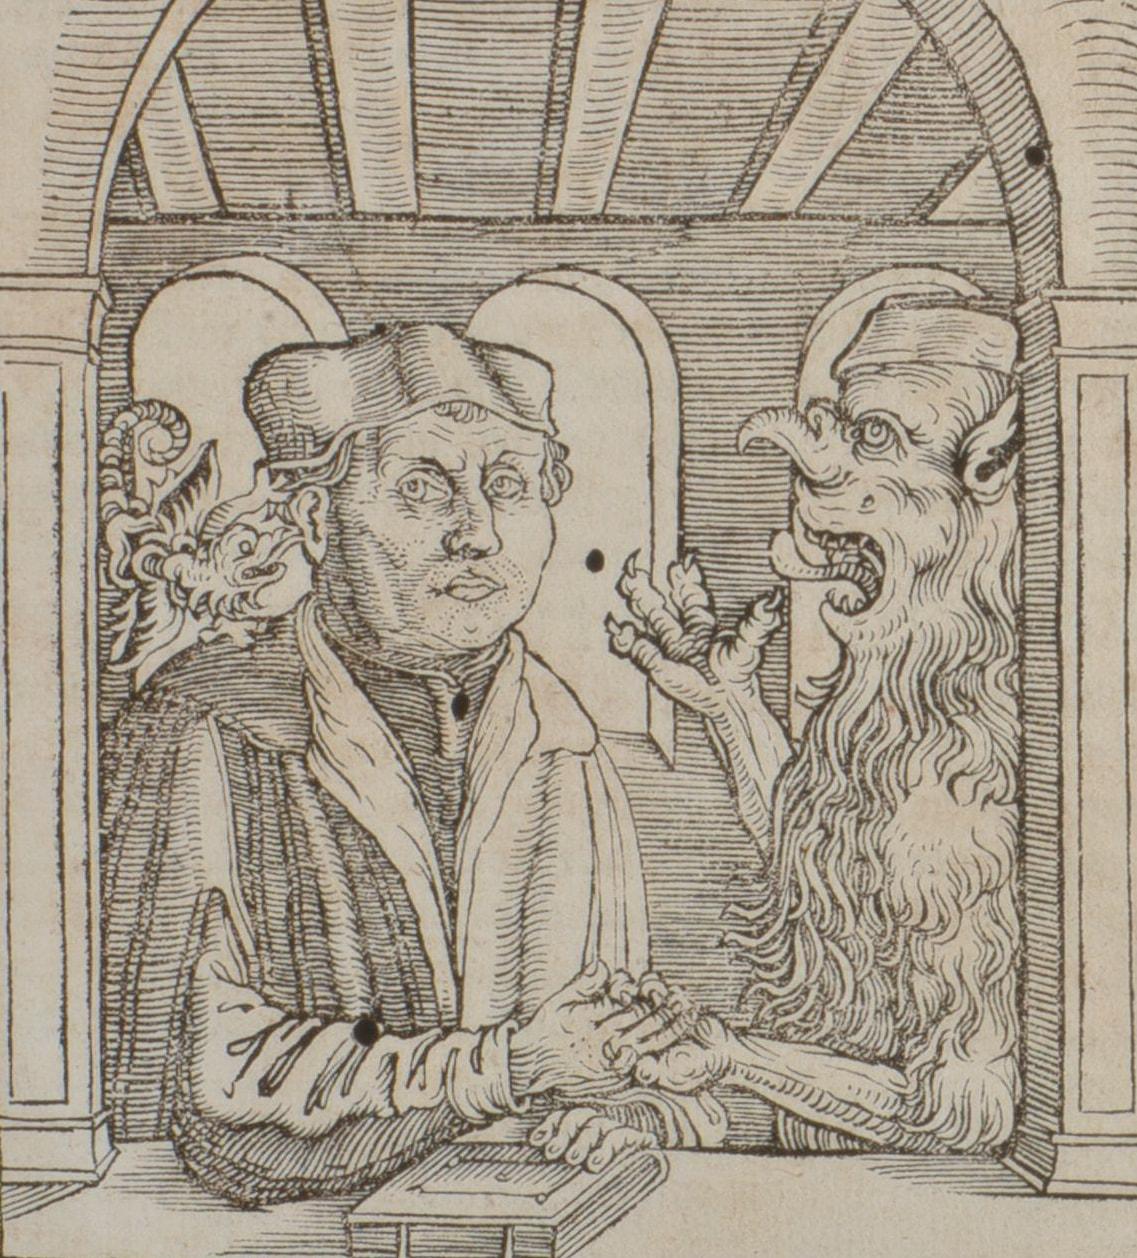 11. Петр Сильвий. Единение Лютера и Люцифера. Лейпциг, 1535.